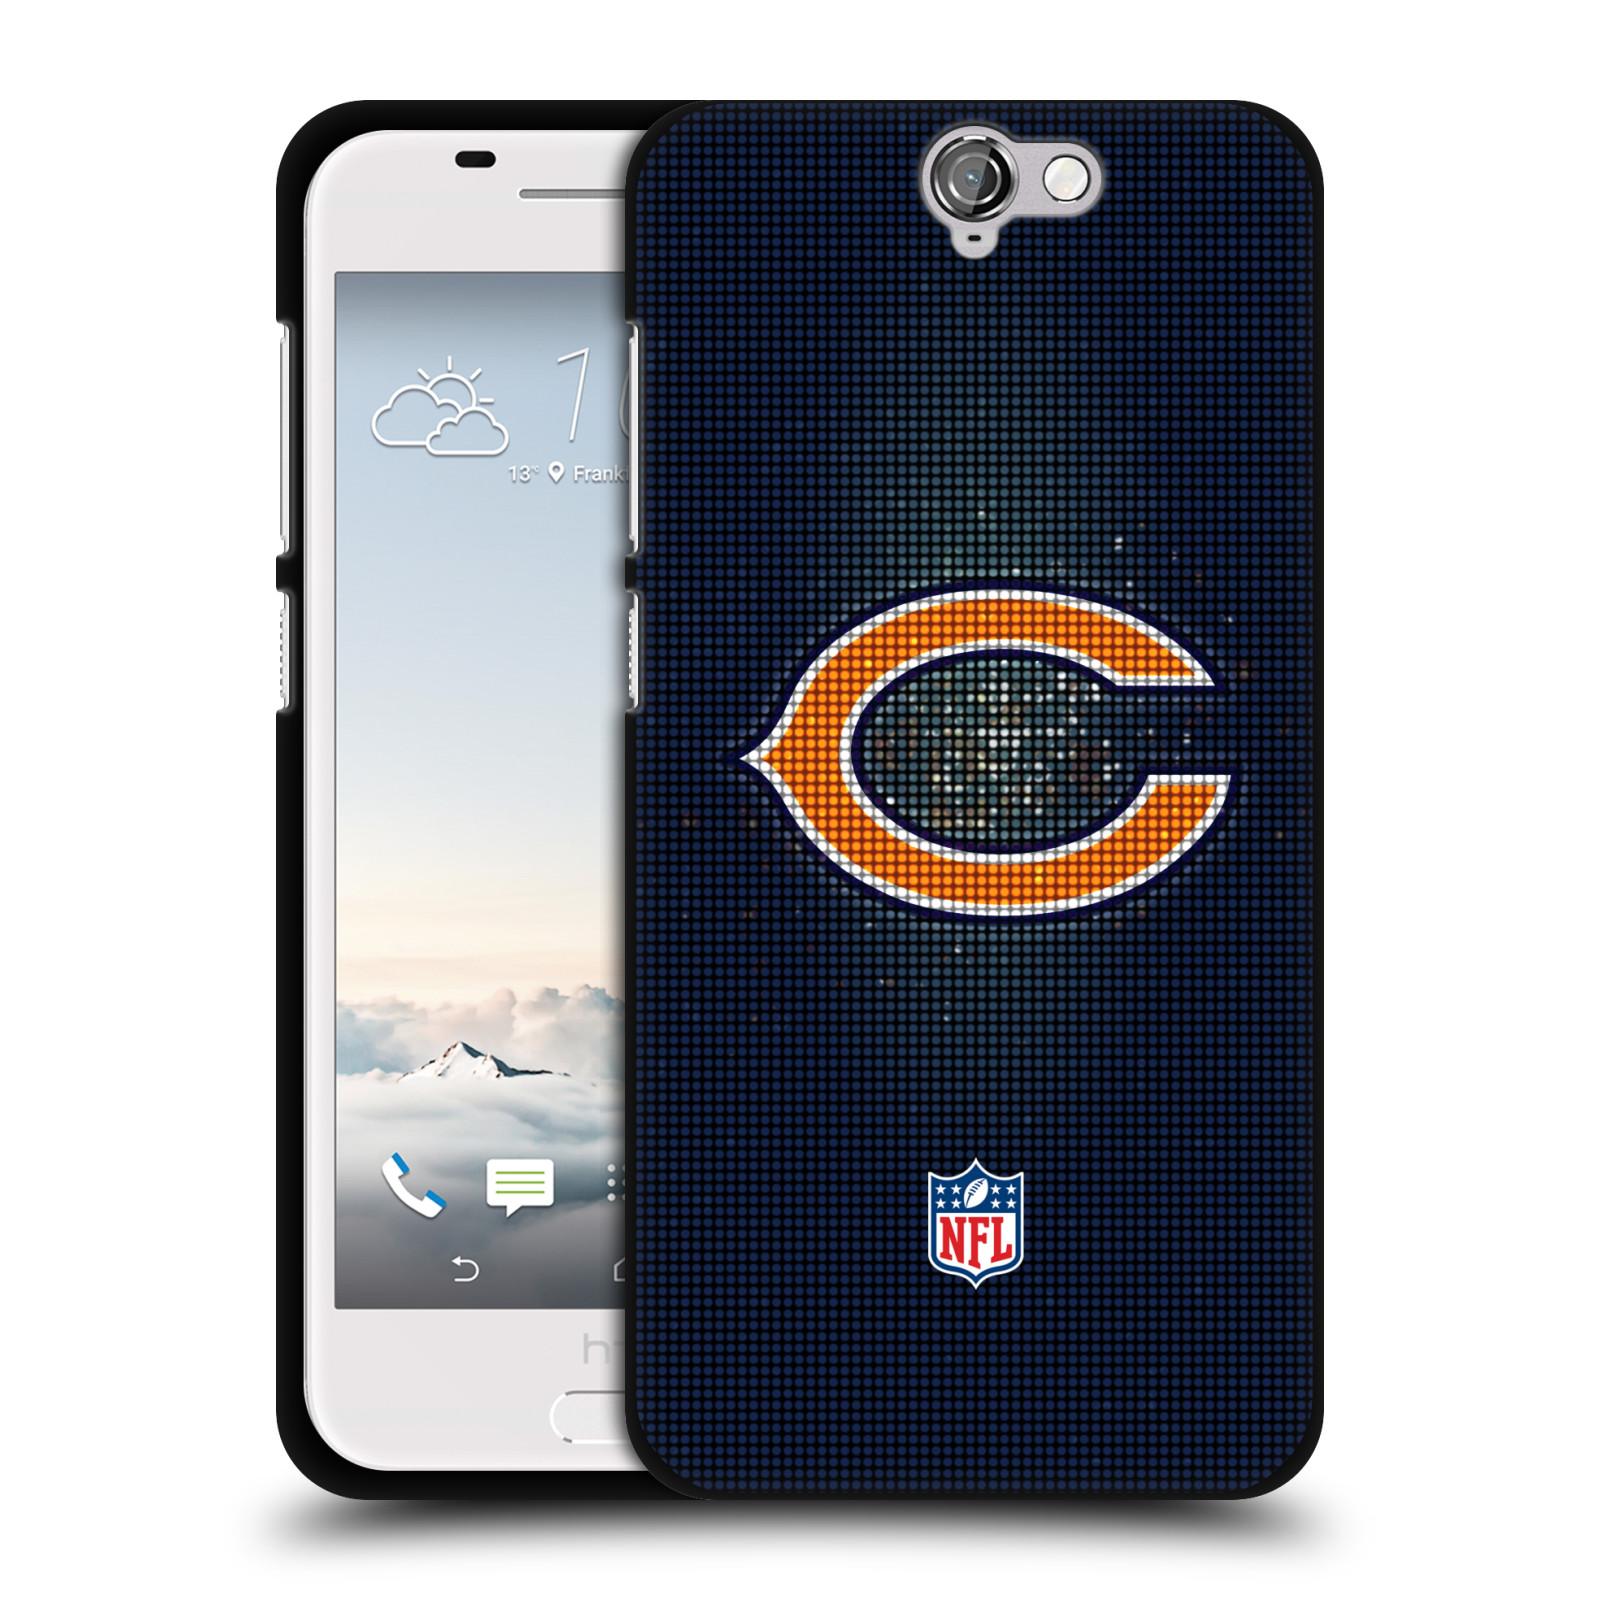 OFFICIAL-NFL-2017-18-CHICAGO-BEARS-BLACK-SOFT-GEL-CASE-FOR-HTC-PHONES